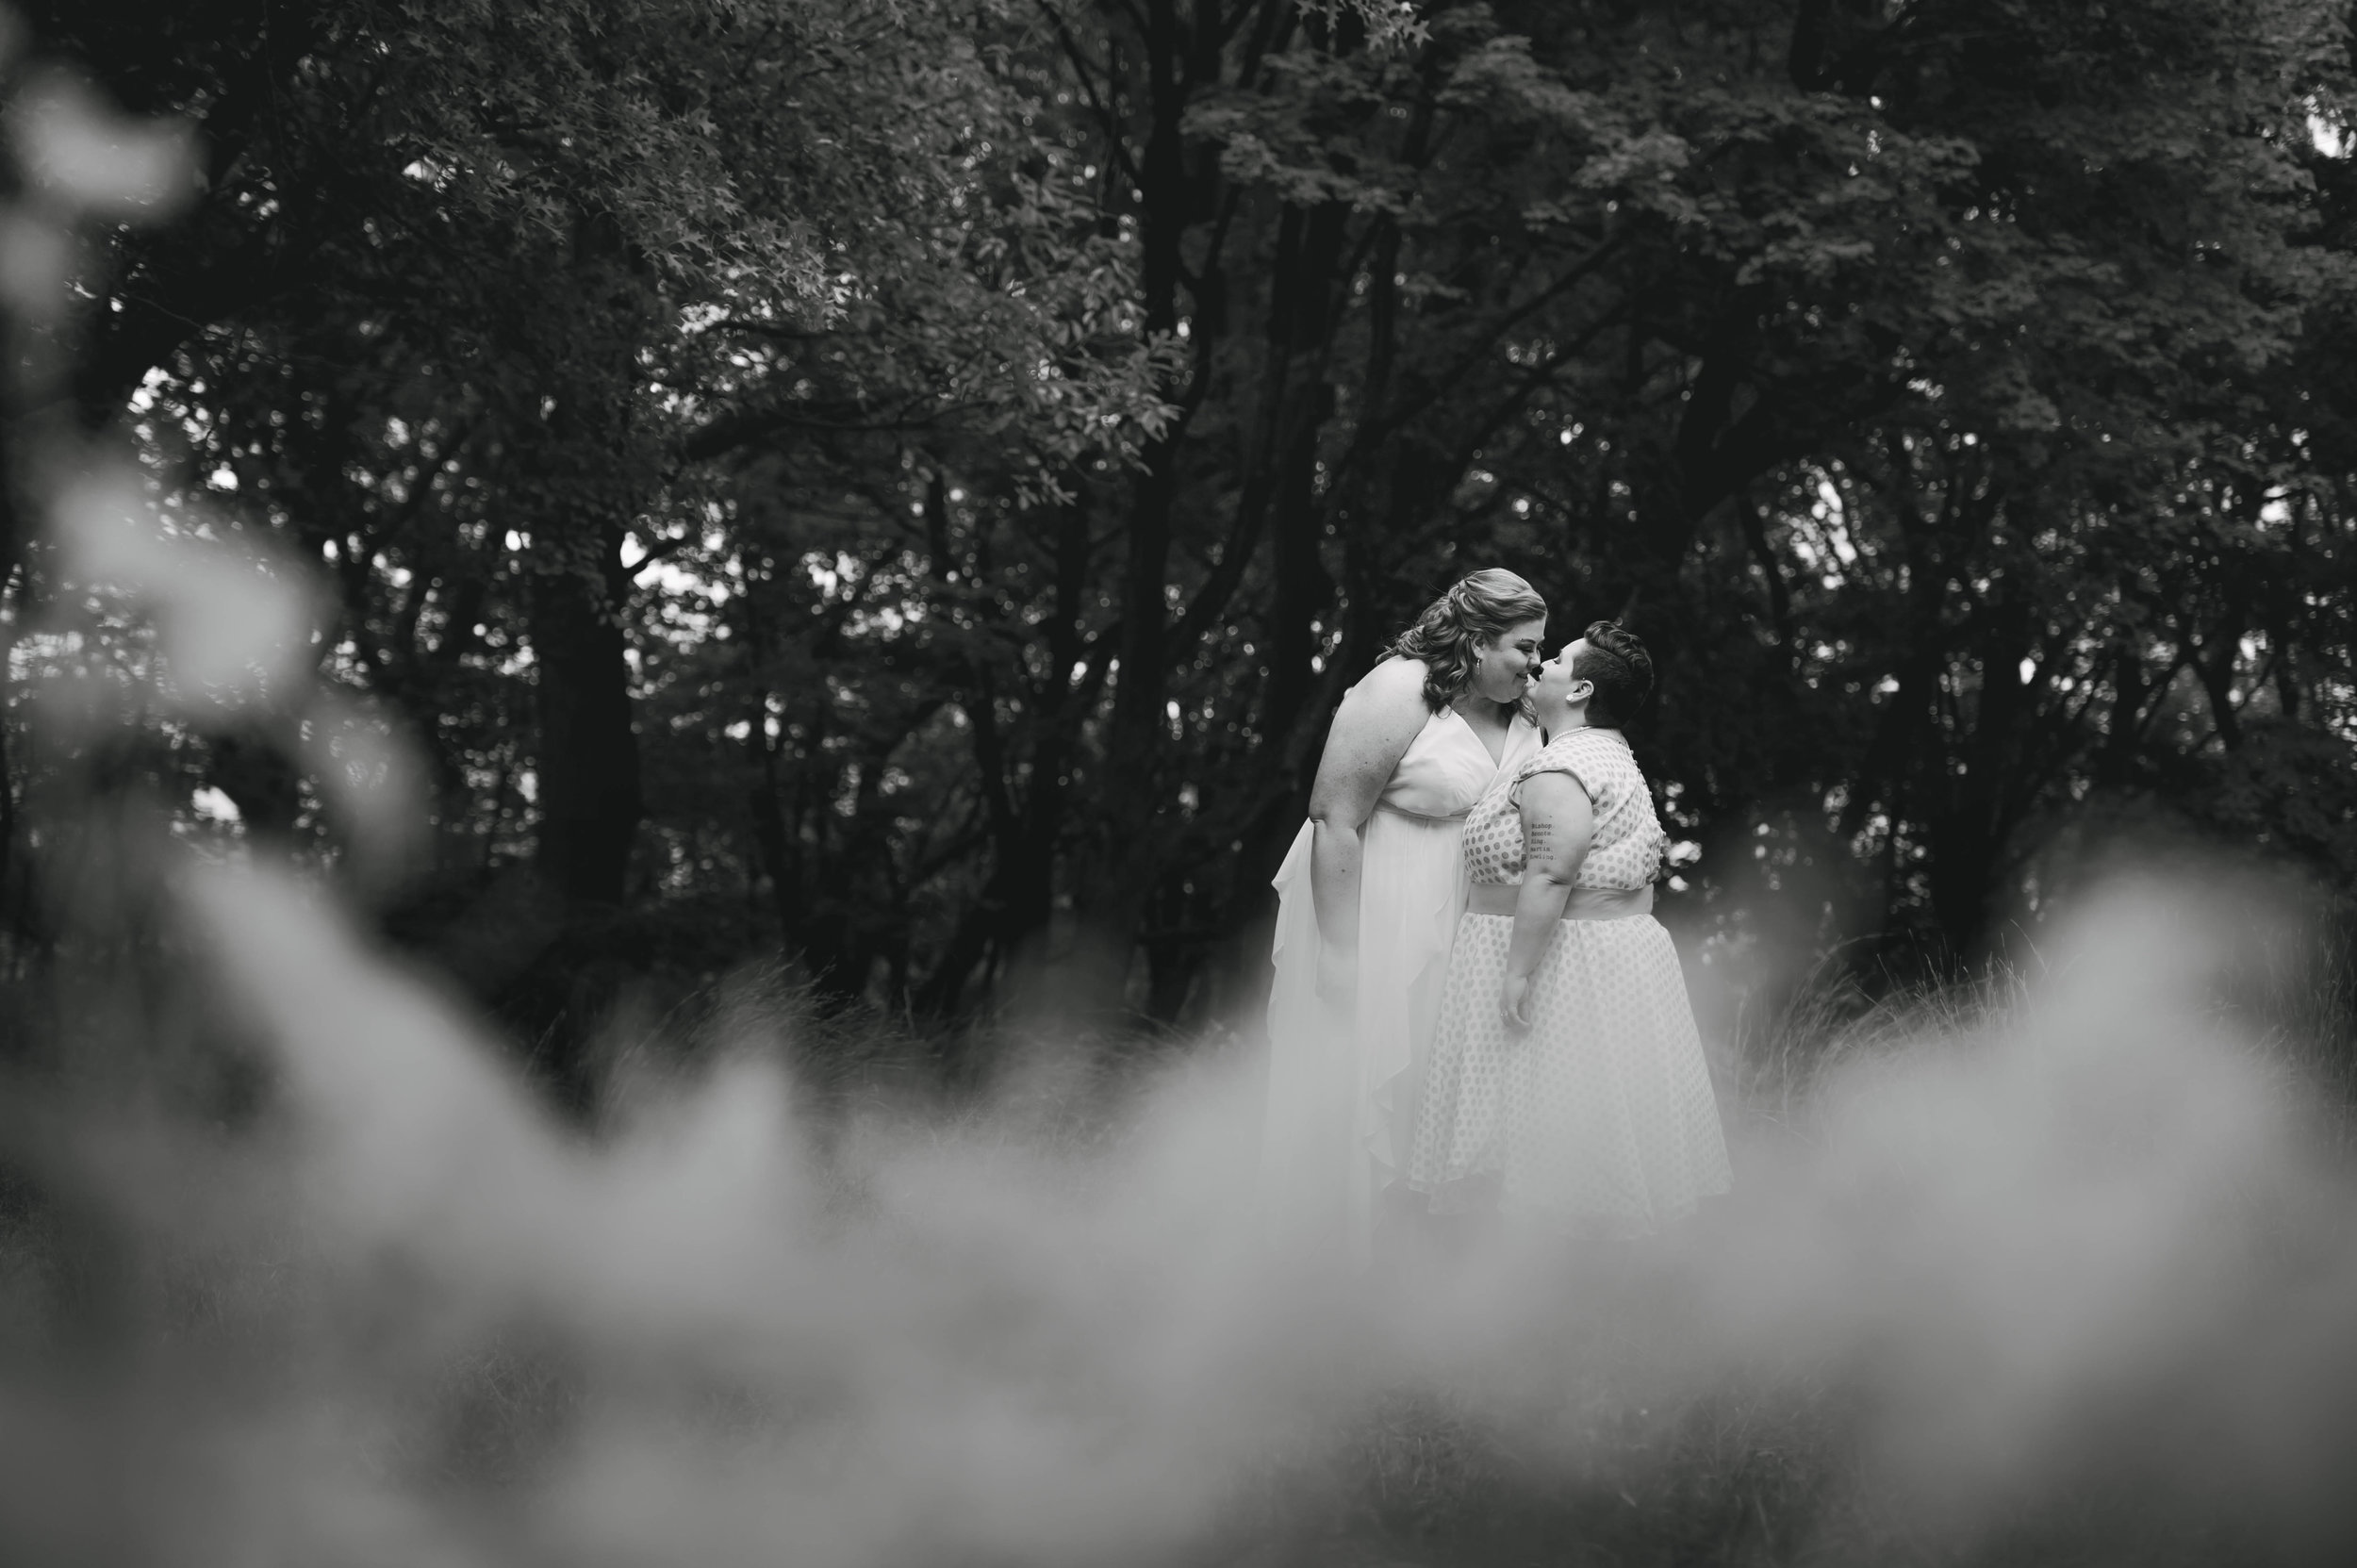 75_north shore ma same sex wedding photographer fifty one hale photography.jpg